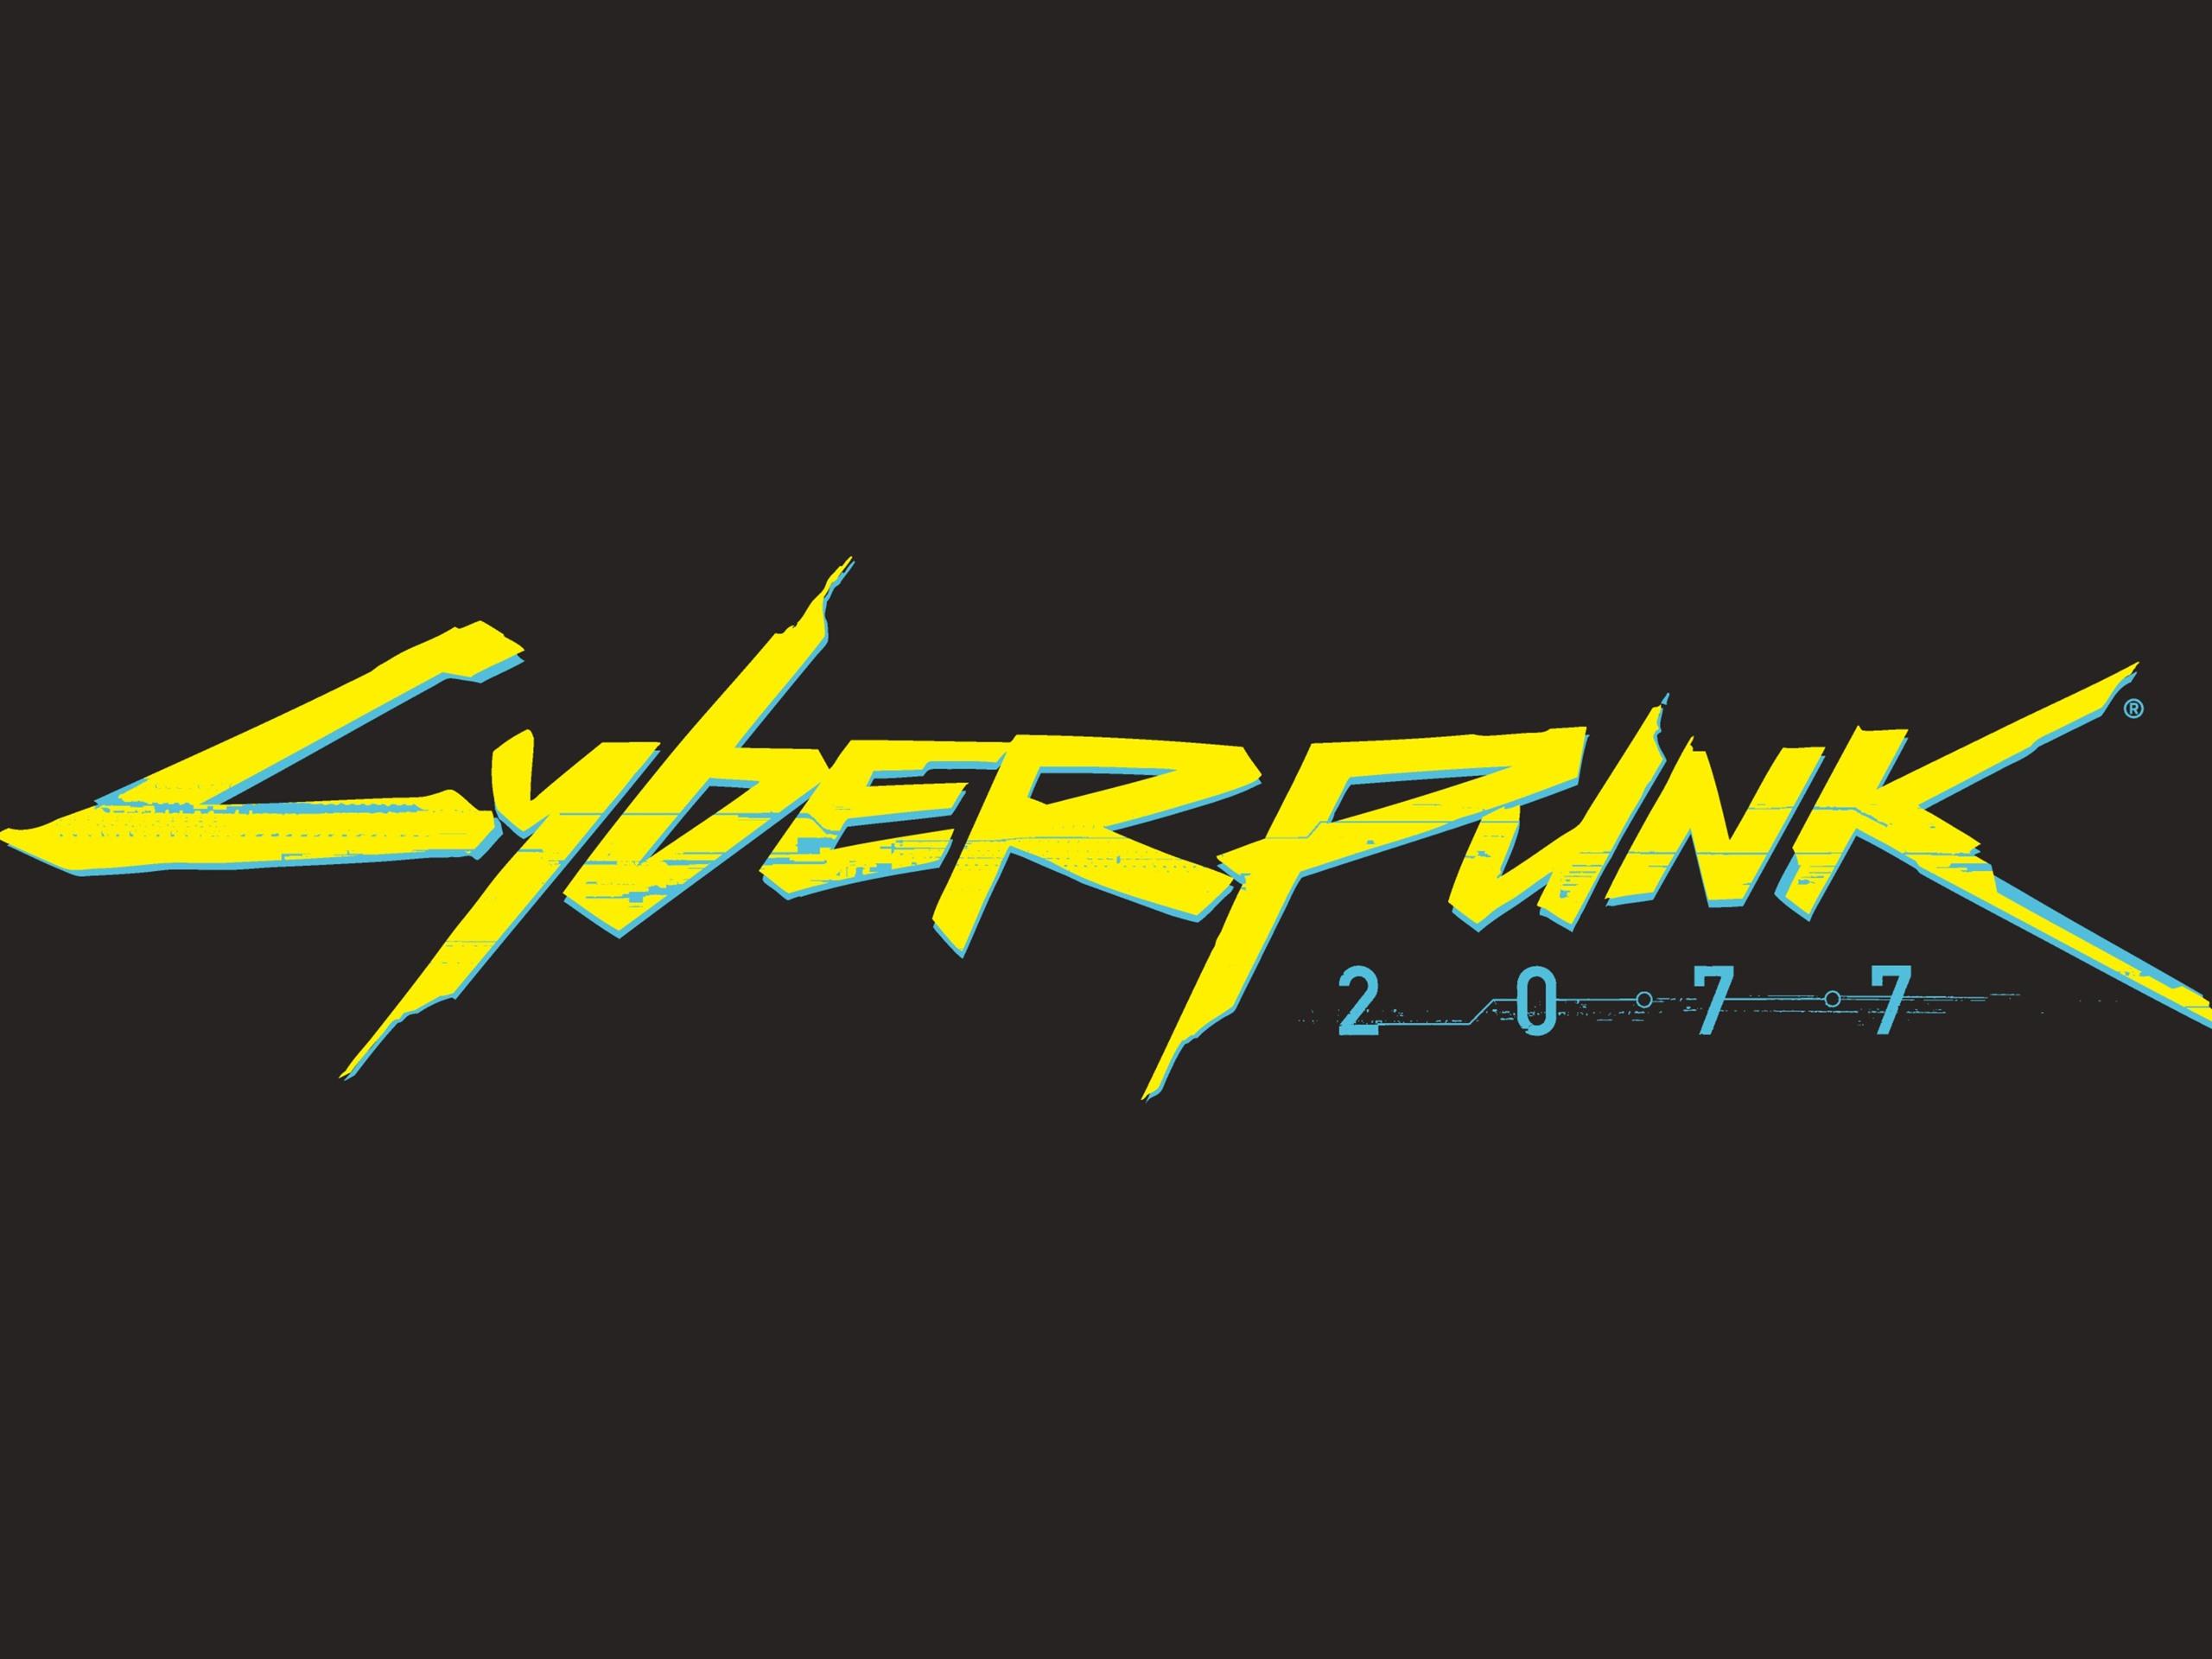 Wallpaper Cyberpunk 2077 logo 3840x2160 UHD 4K Picture, Image